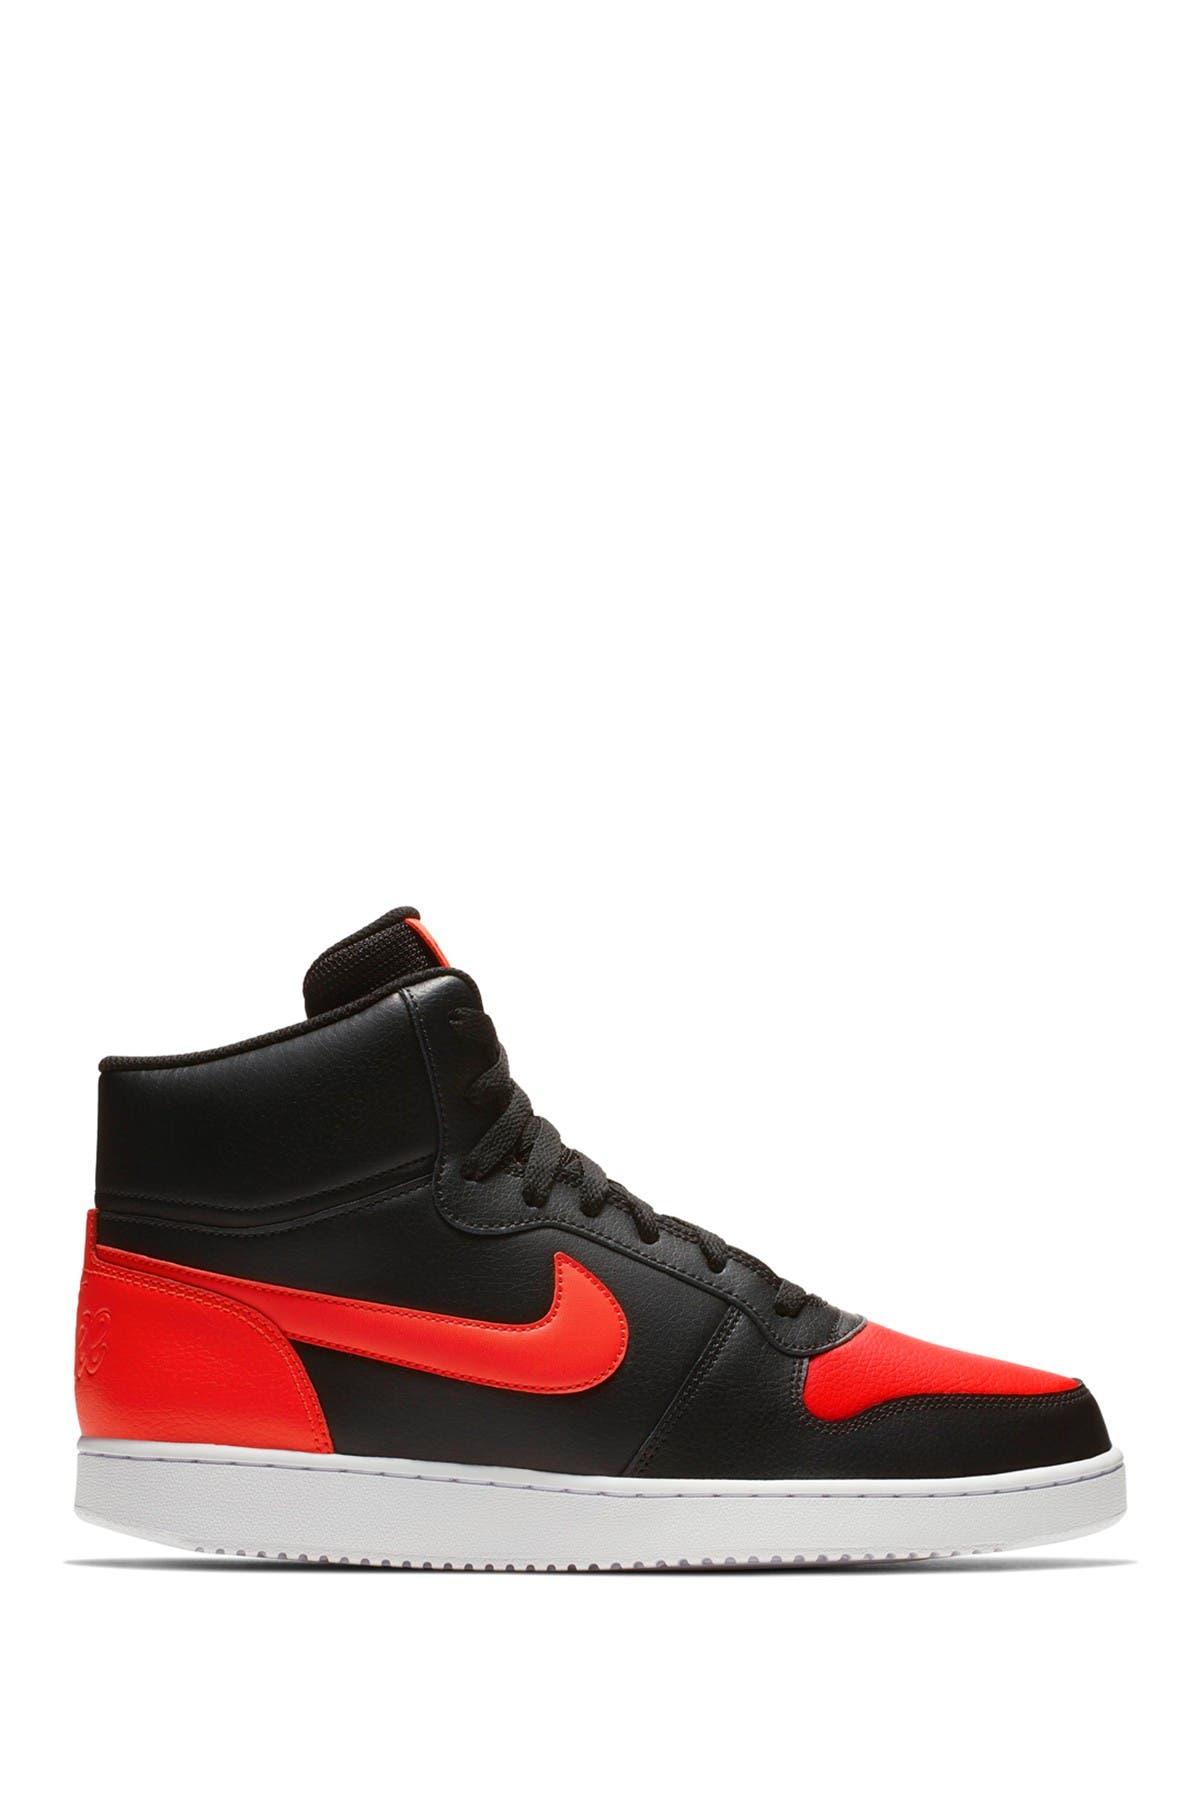 Nike | Ebernon Mid Basketball Sneaker